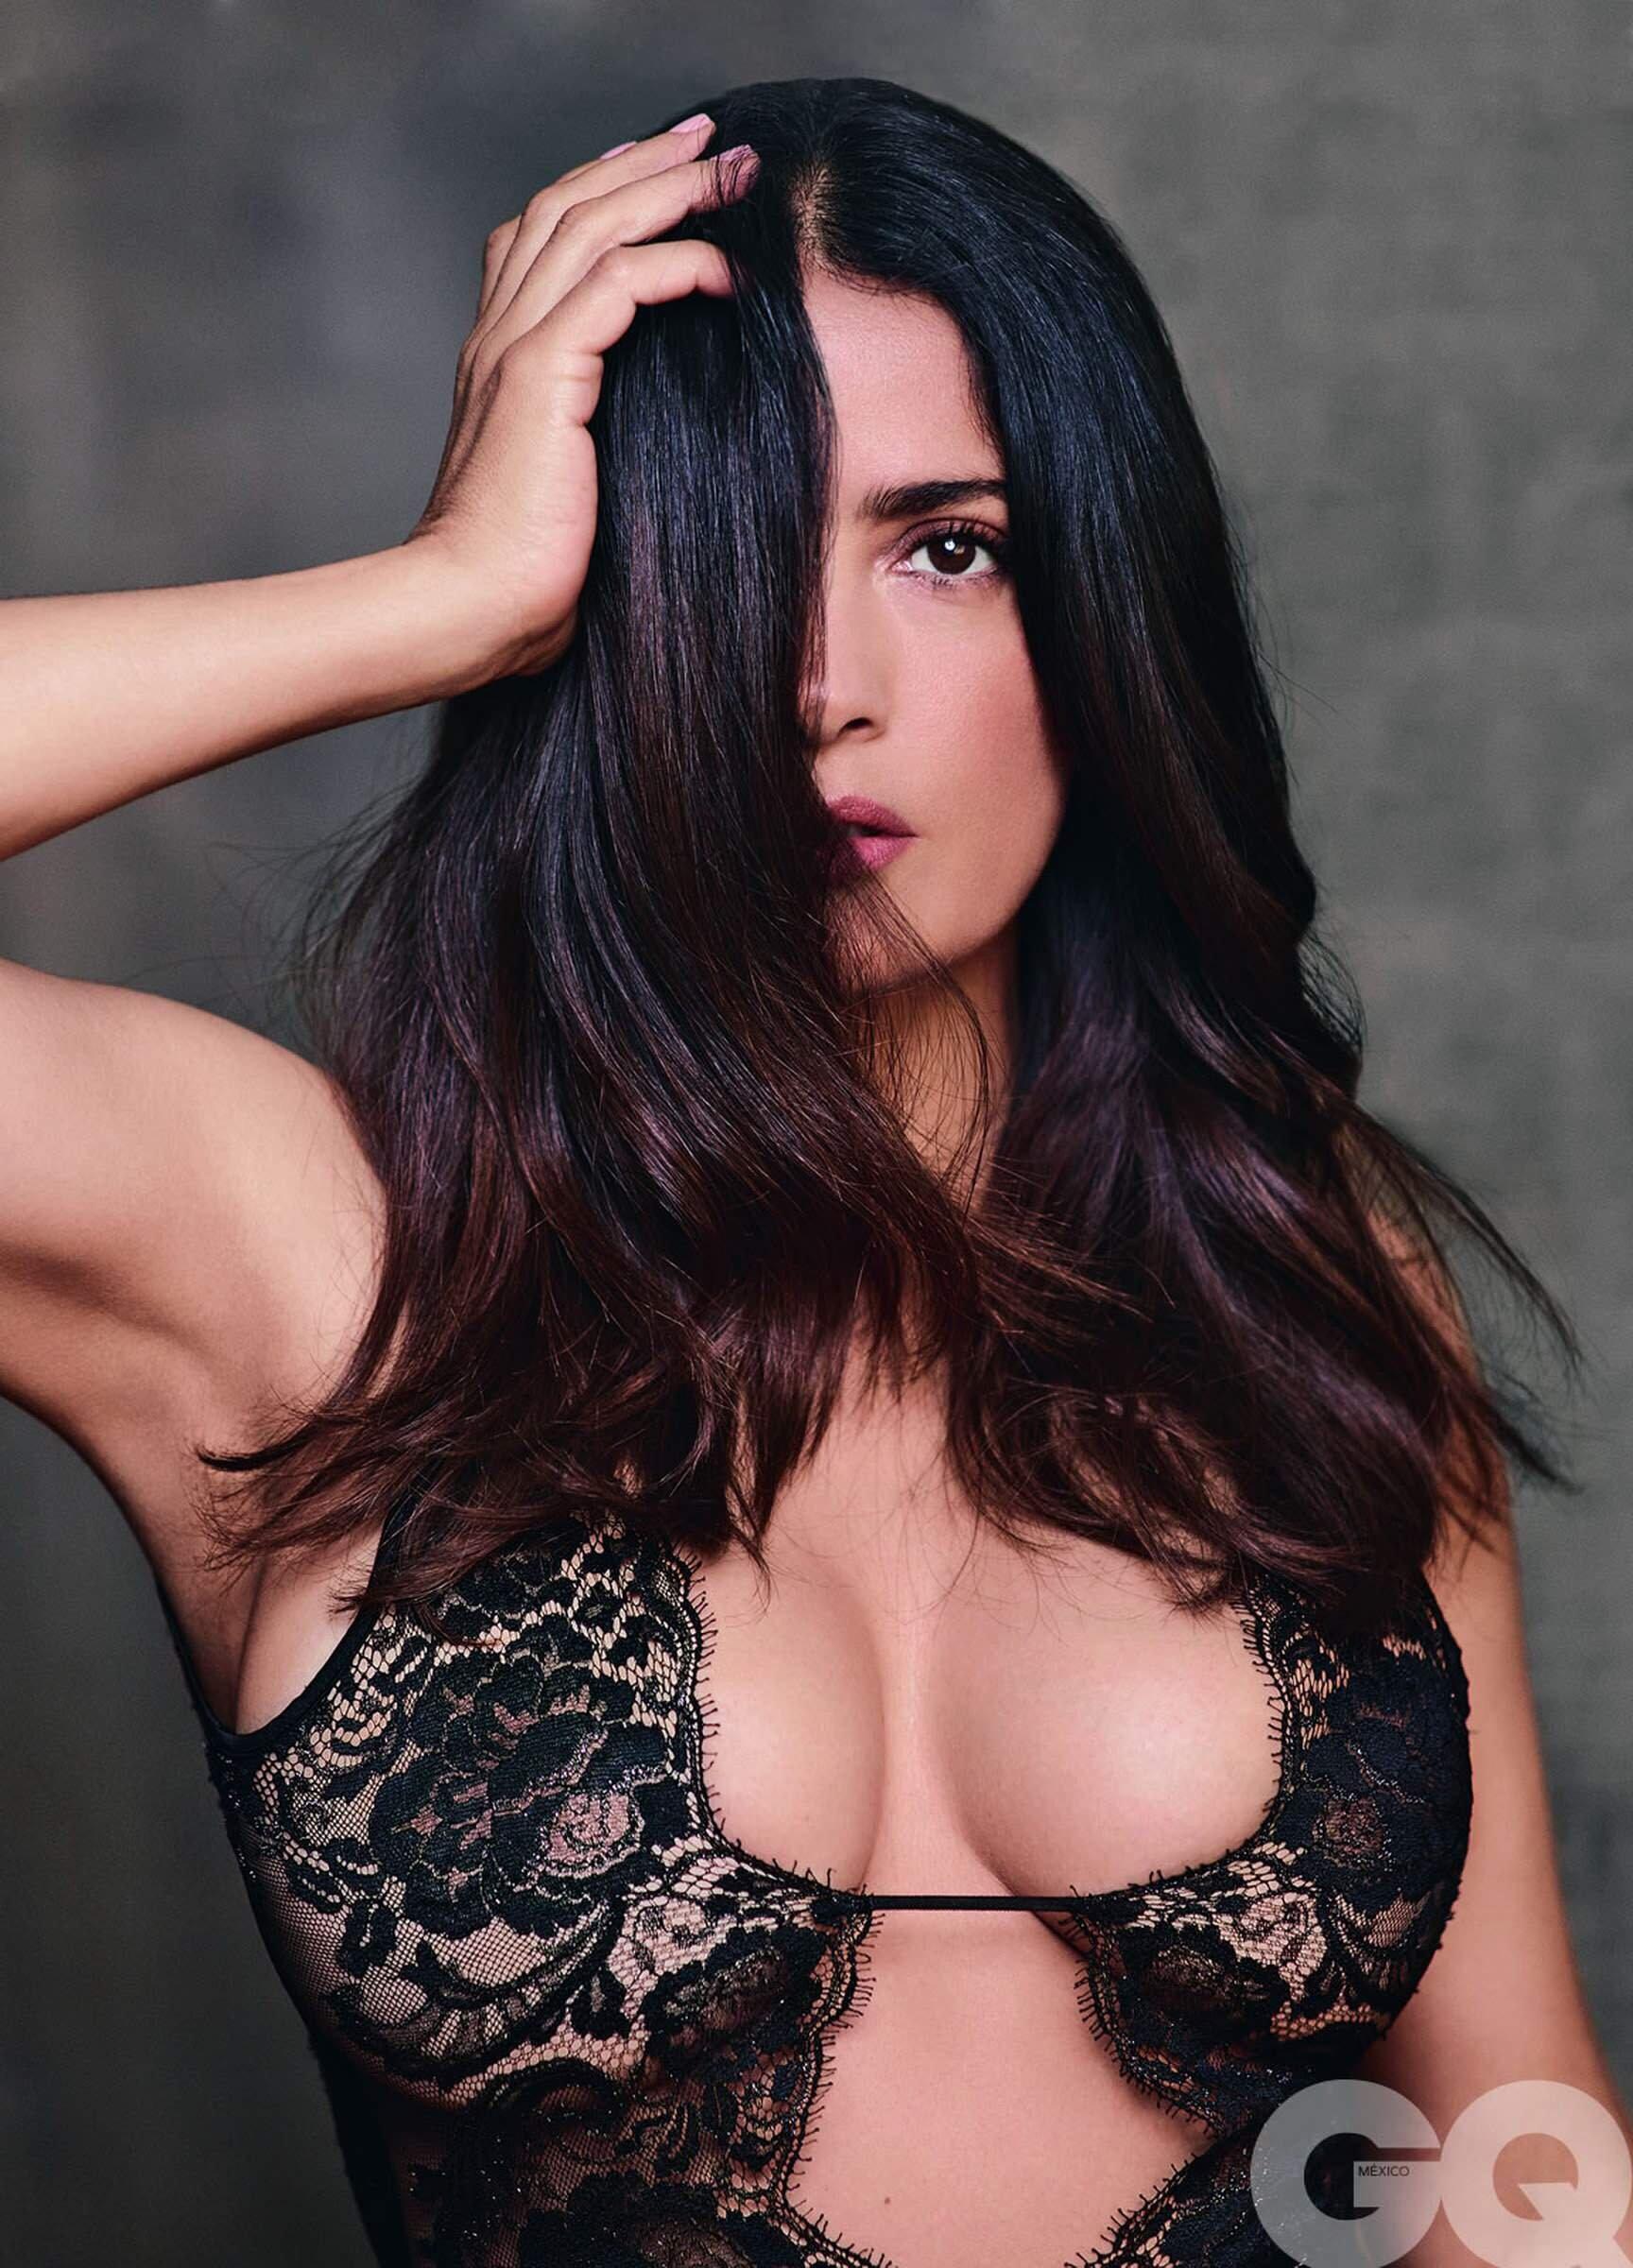 Videá porno de Salma Hayek